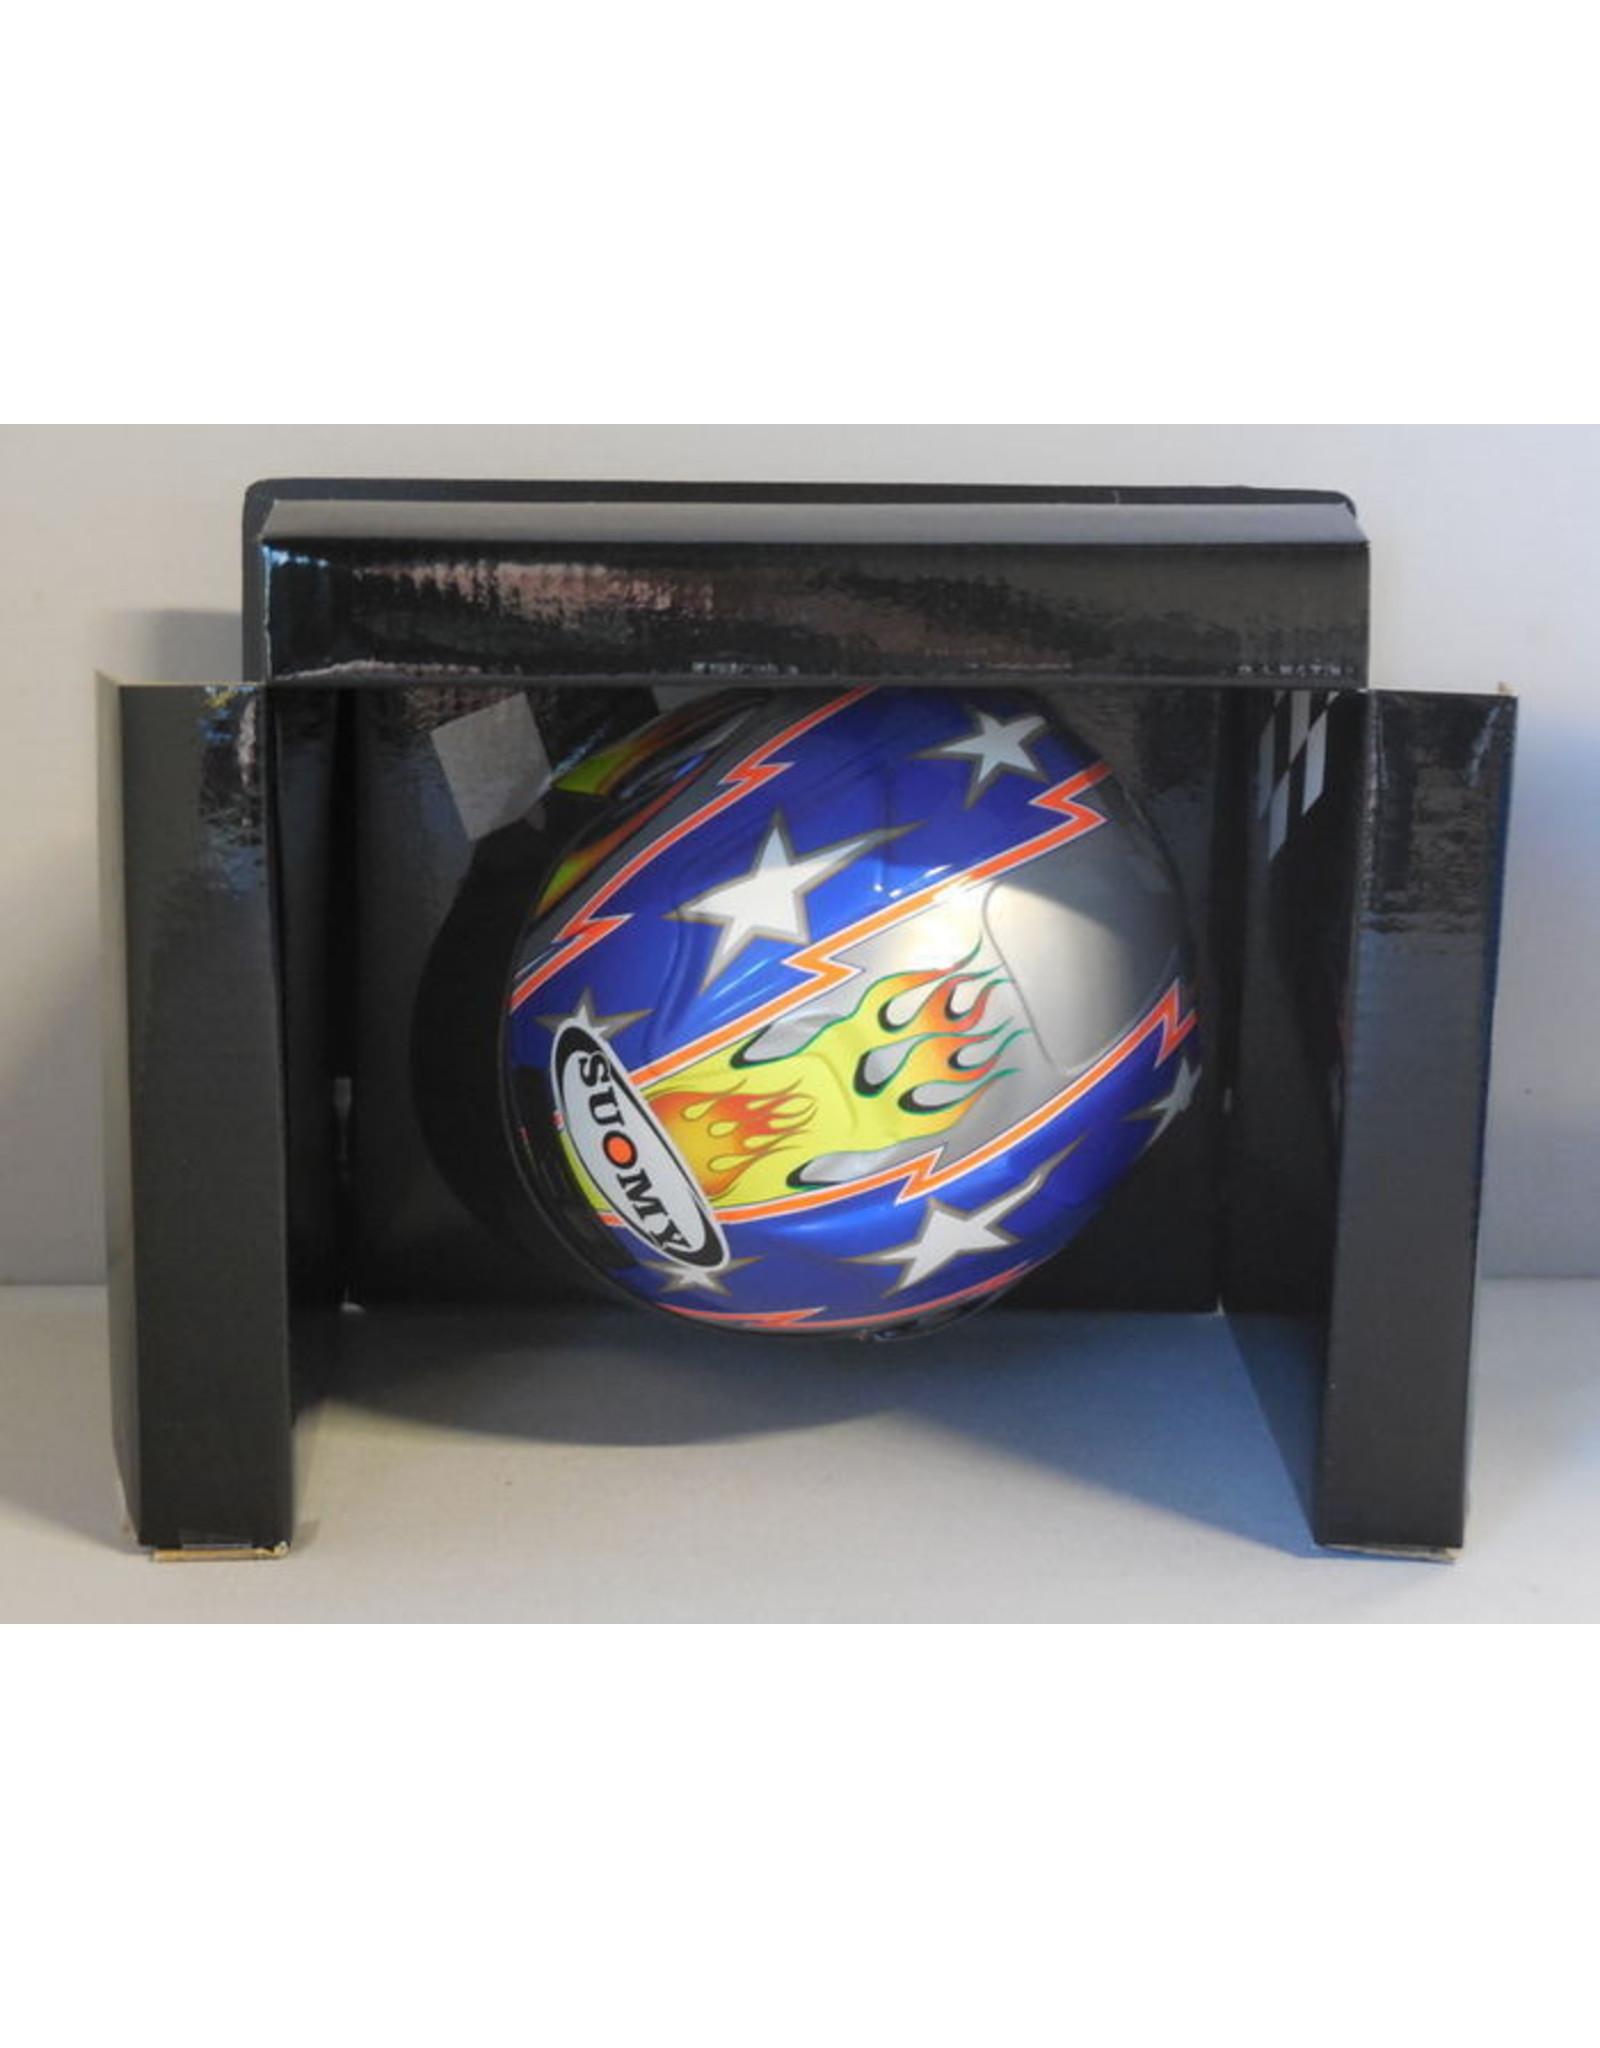 Minichamps Helm B. Bostrom 2001 Laguna Seca Suomy Helm - 1:2 - Minichamps